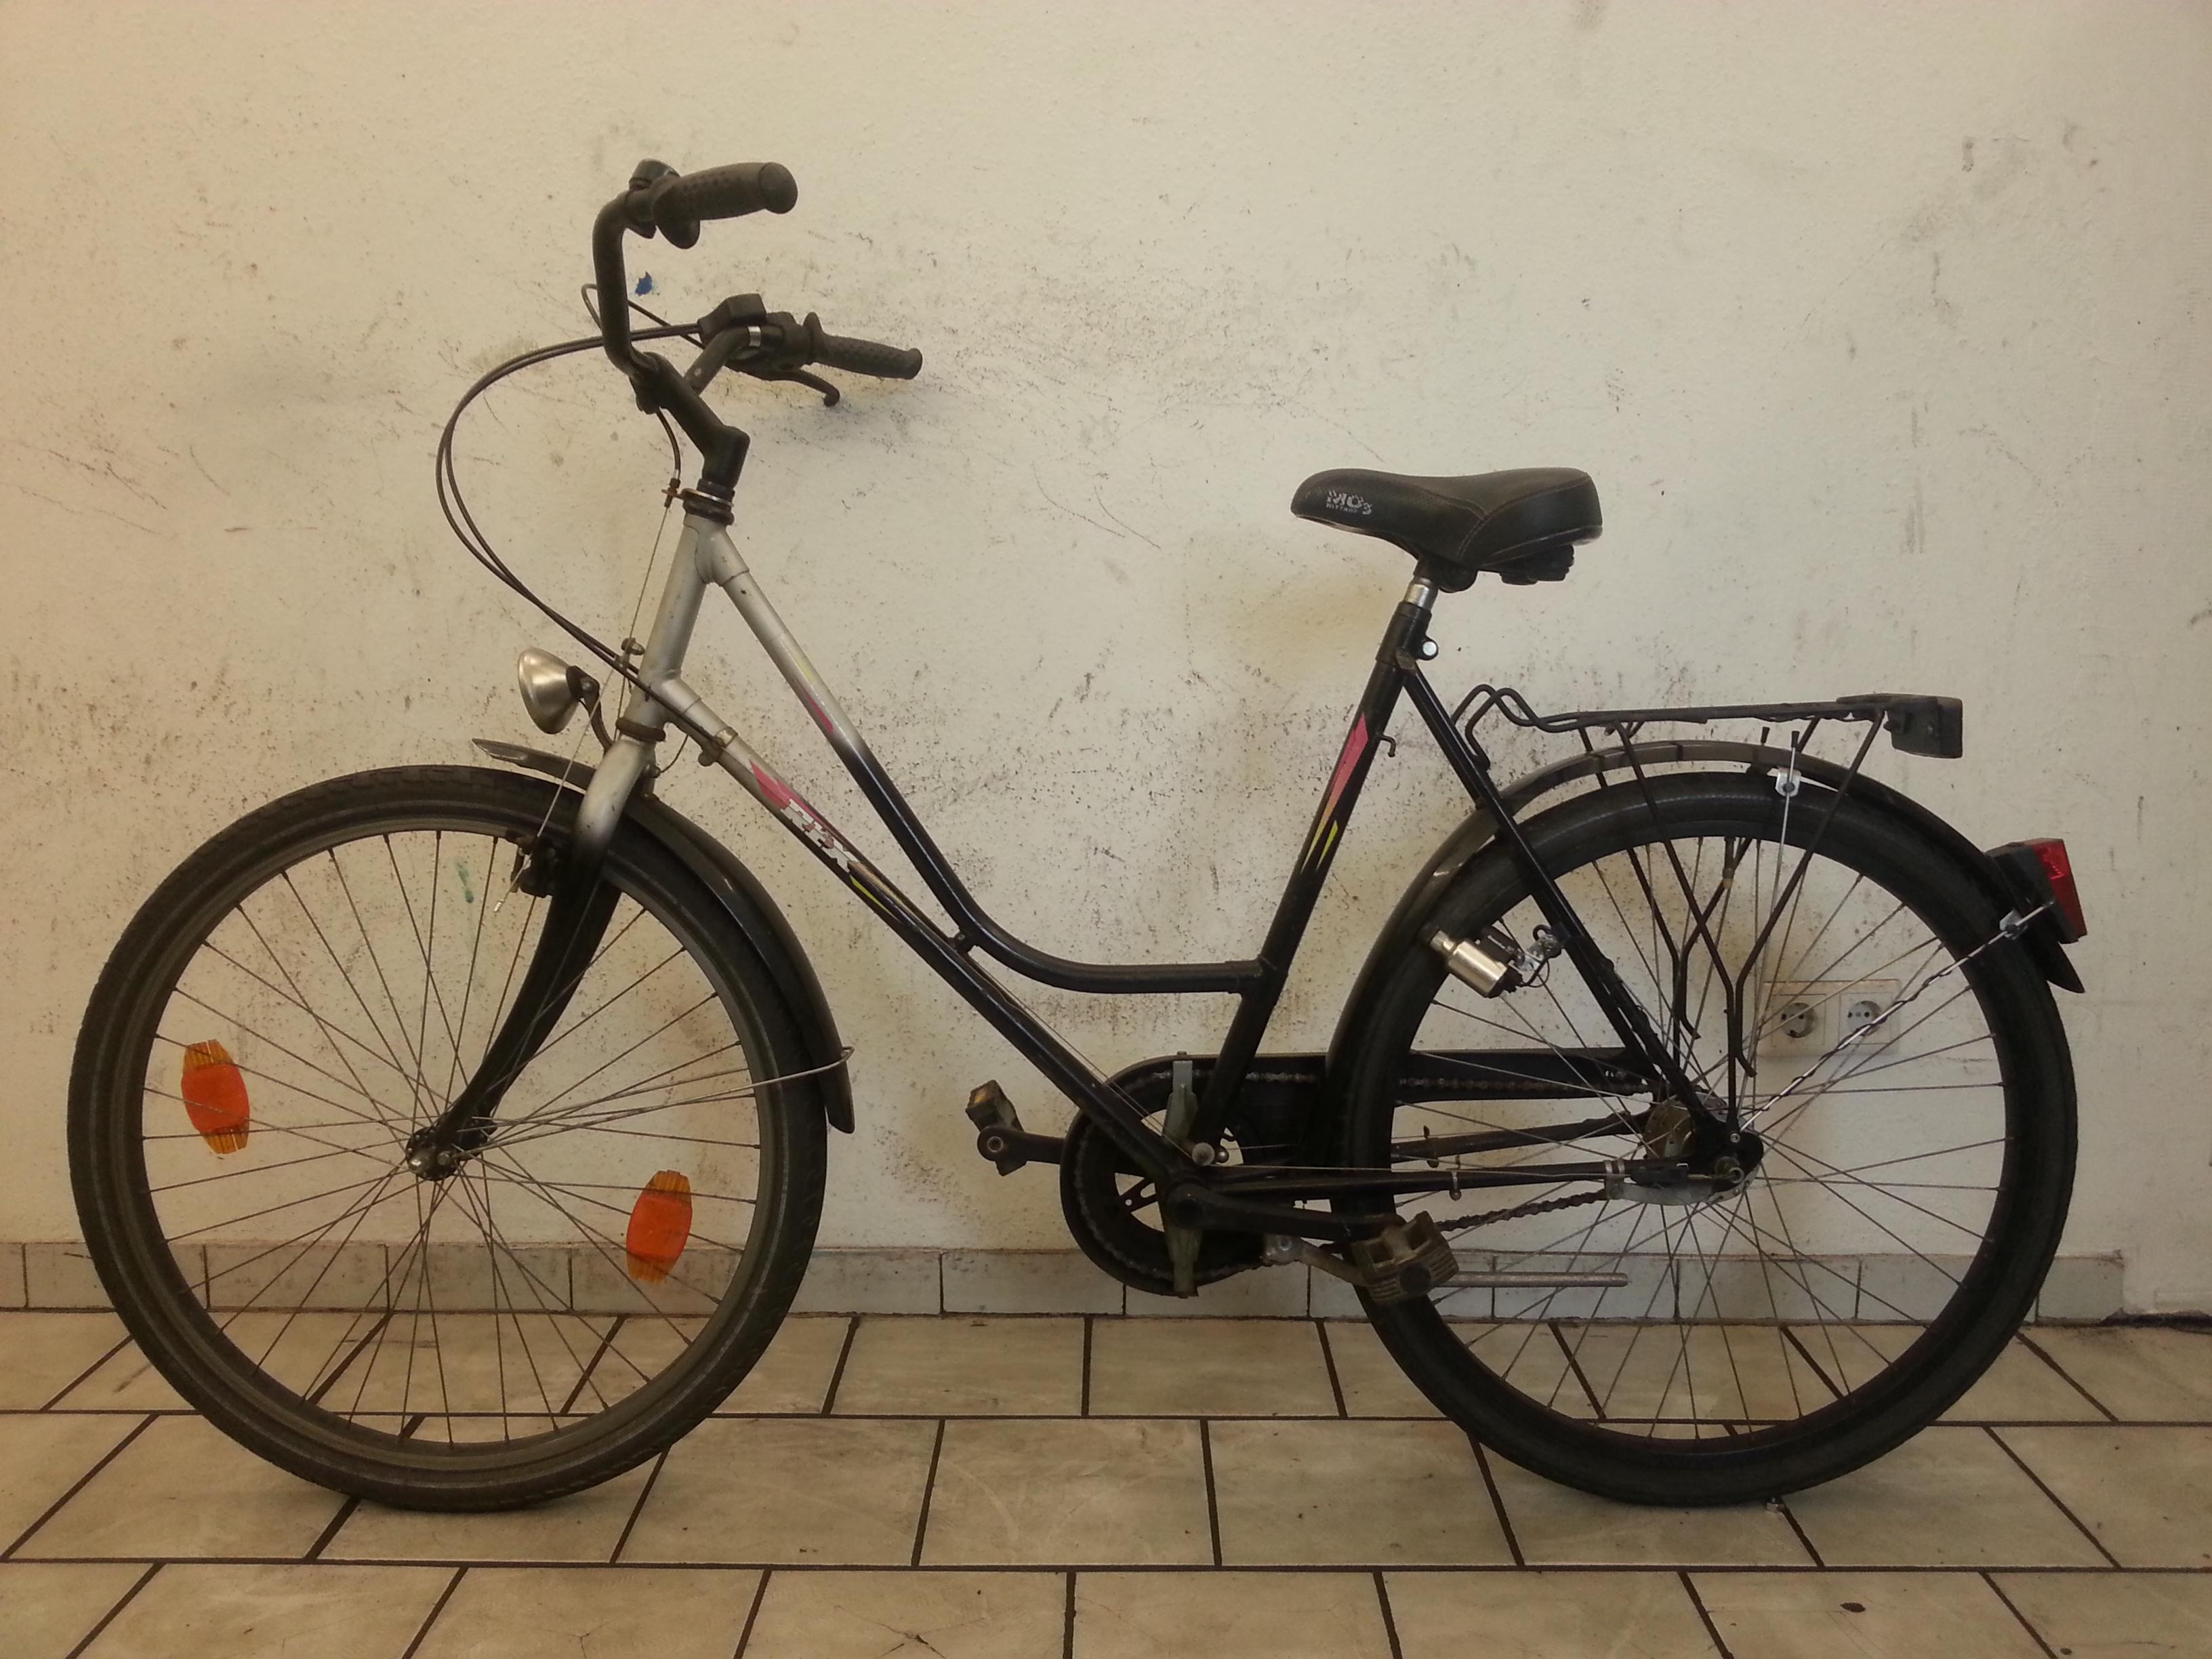 fahrradgeschäft münster steinfurter str